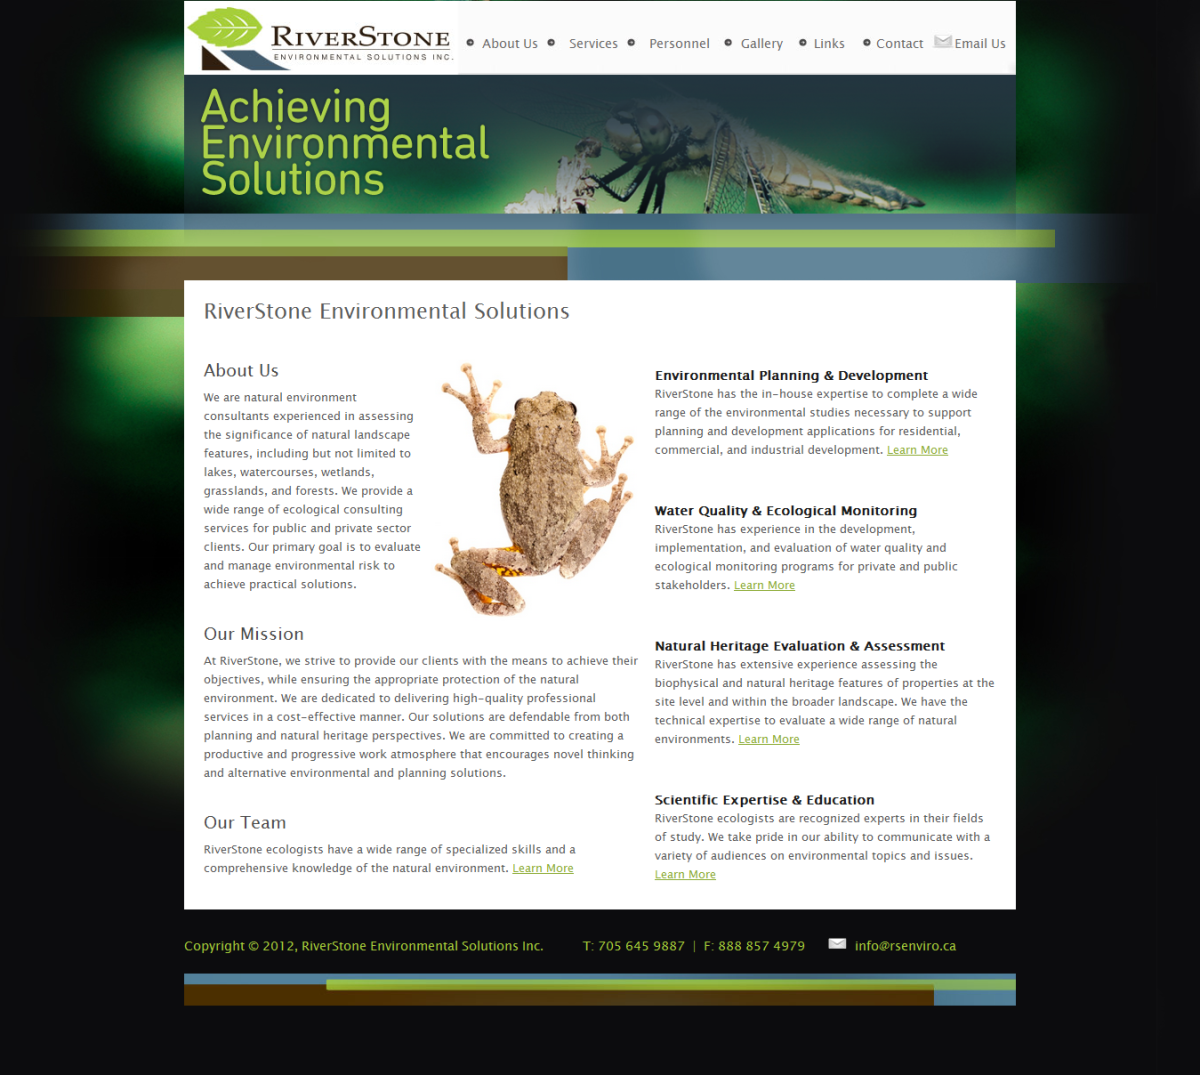 RiverStone Environmental Solutions